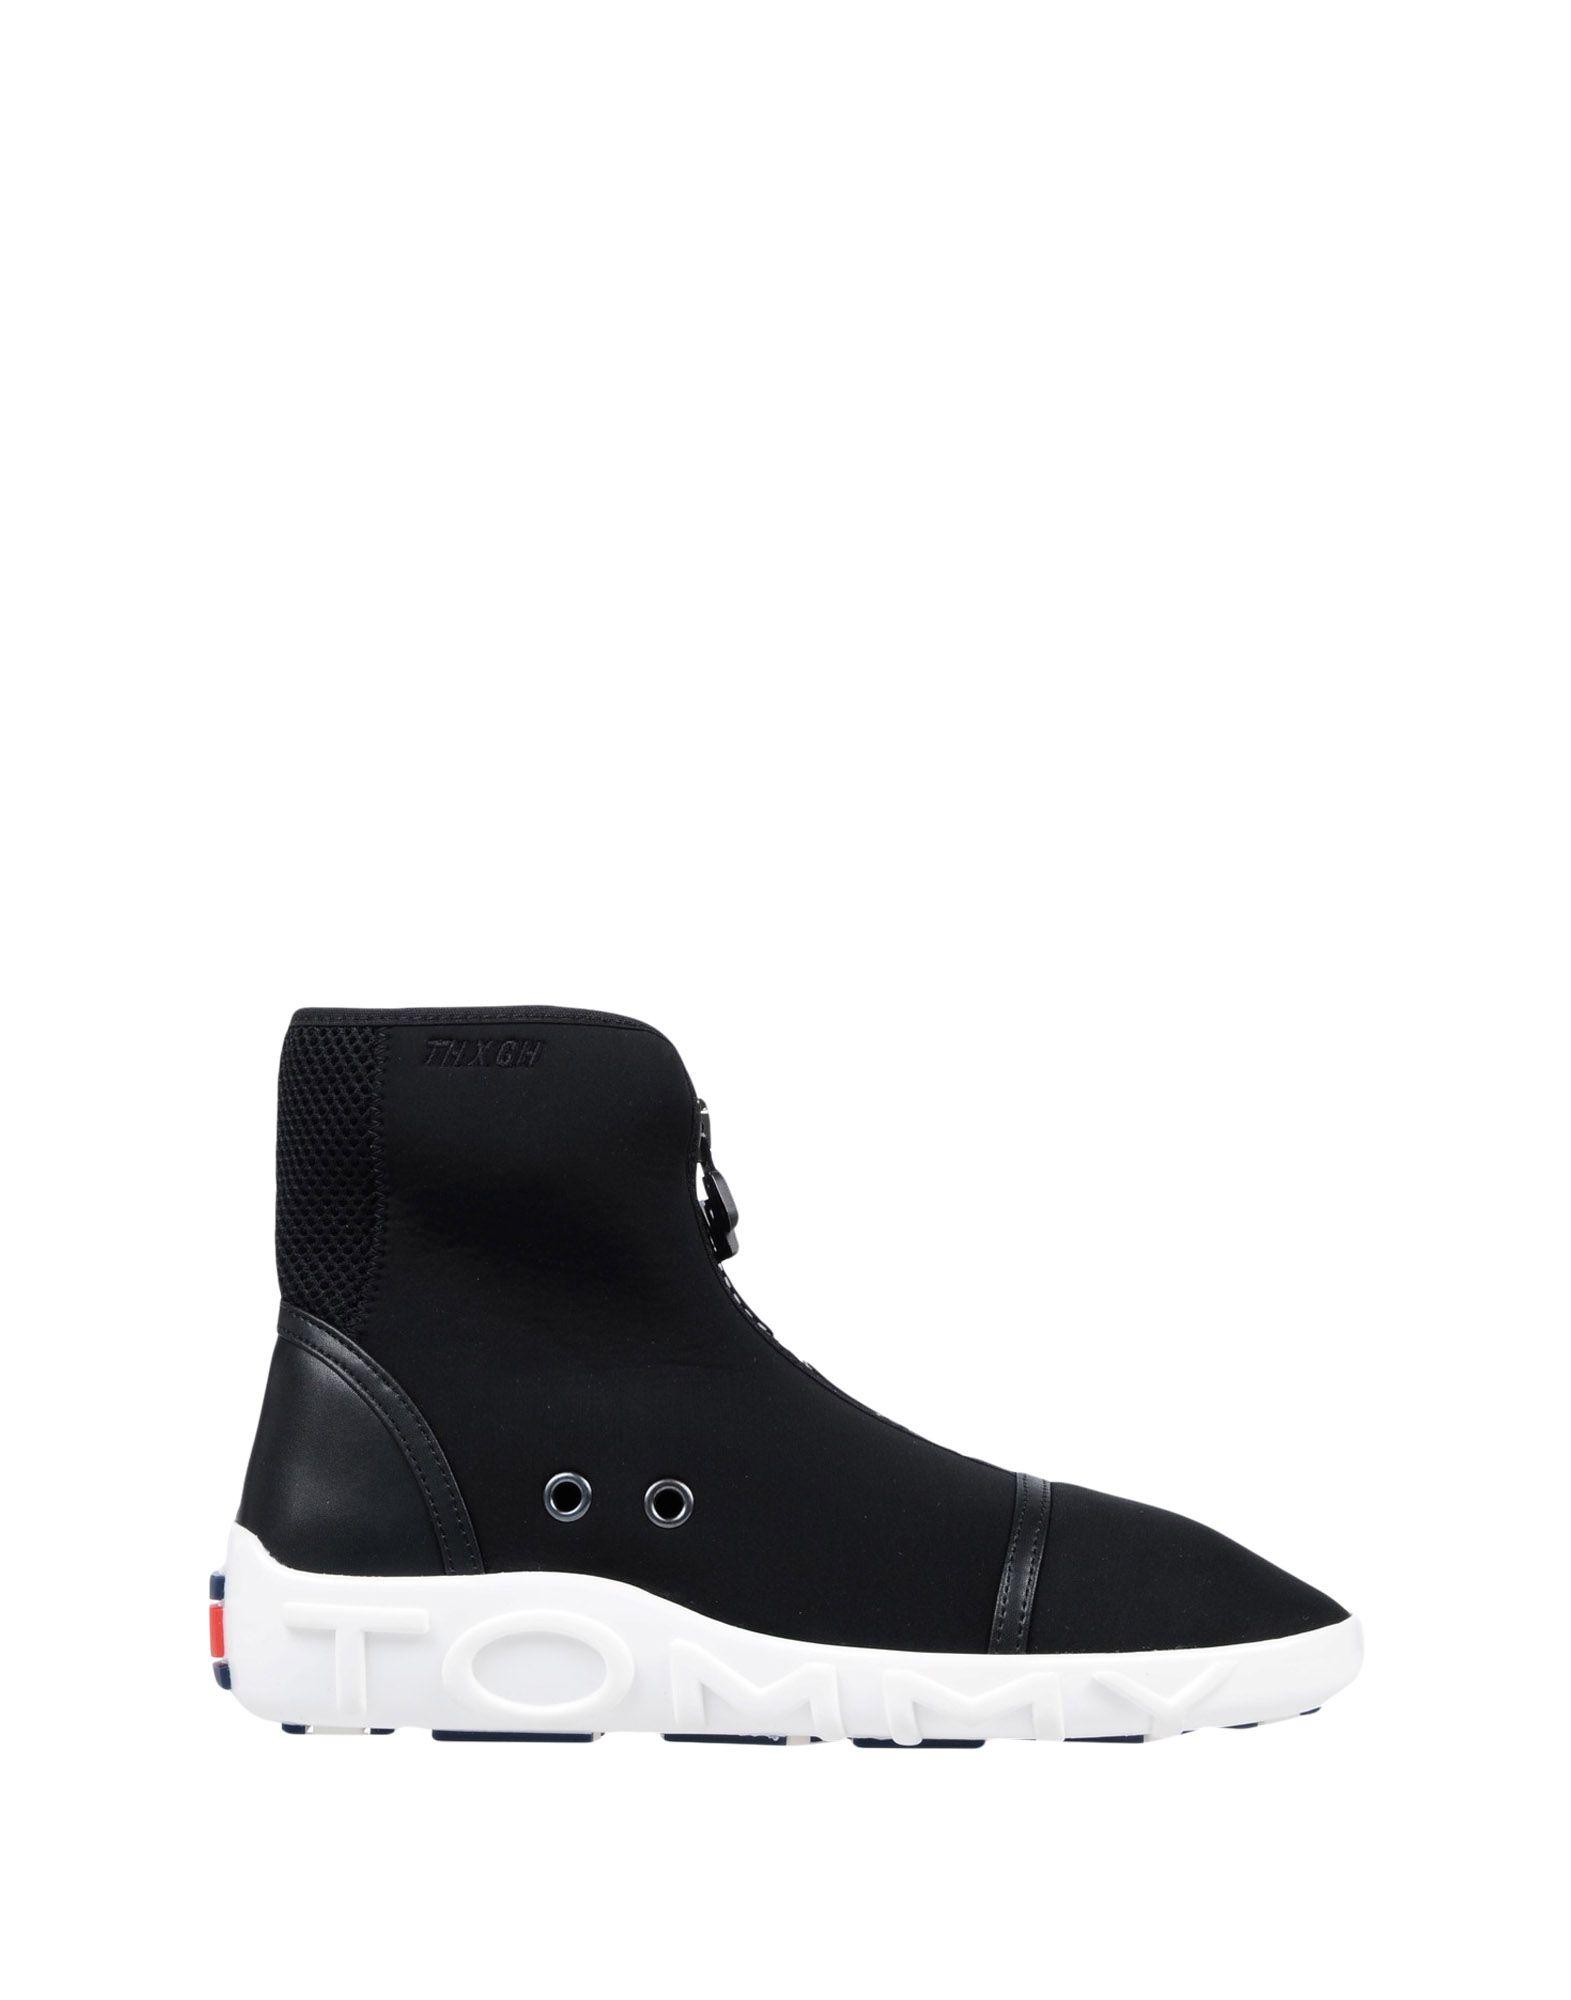 Sneakers Gigi Hadid X Tommy Hilfiger G.Hadid Neoprene Boot Sneaker - Femme - Sneakers Gigi Hadid X Tommy Hilfiger sur